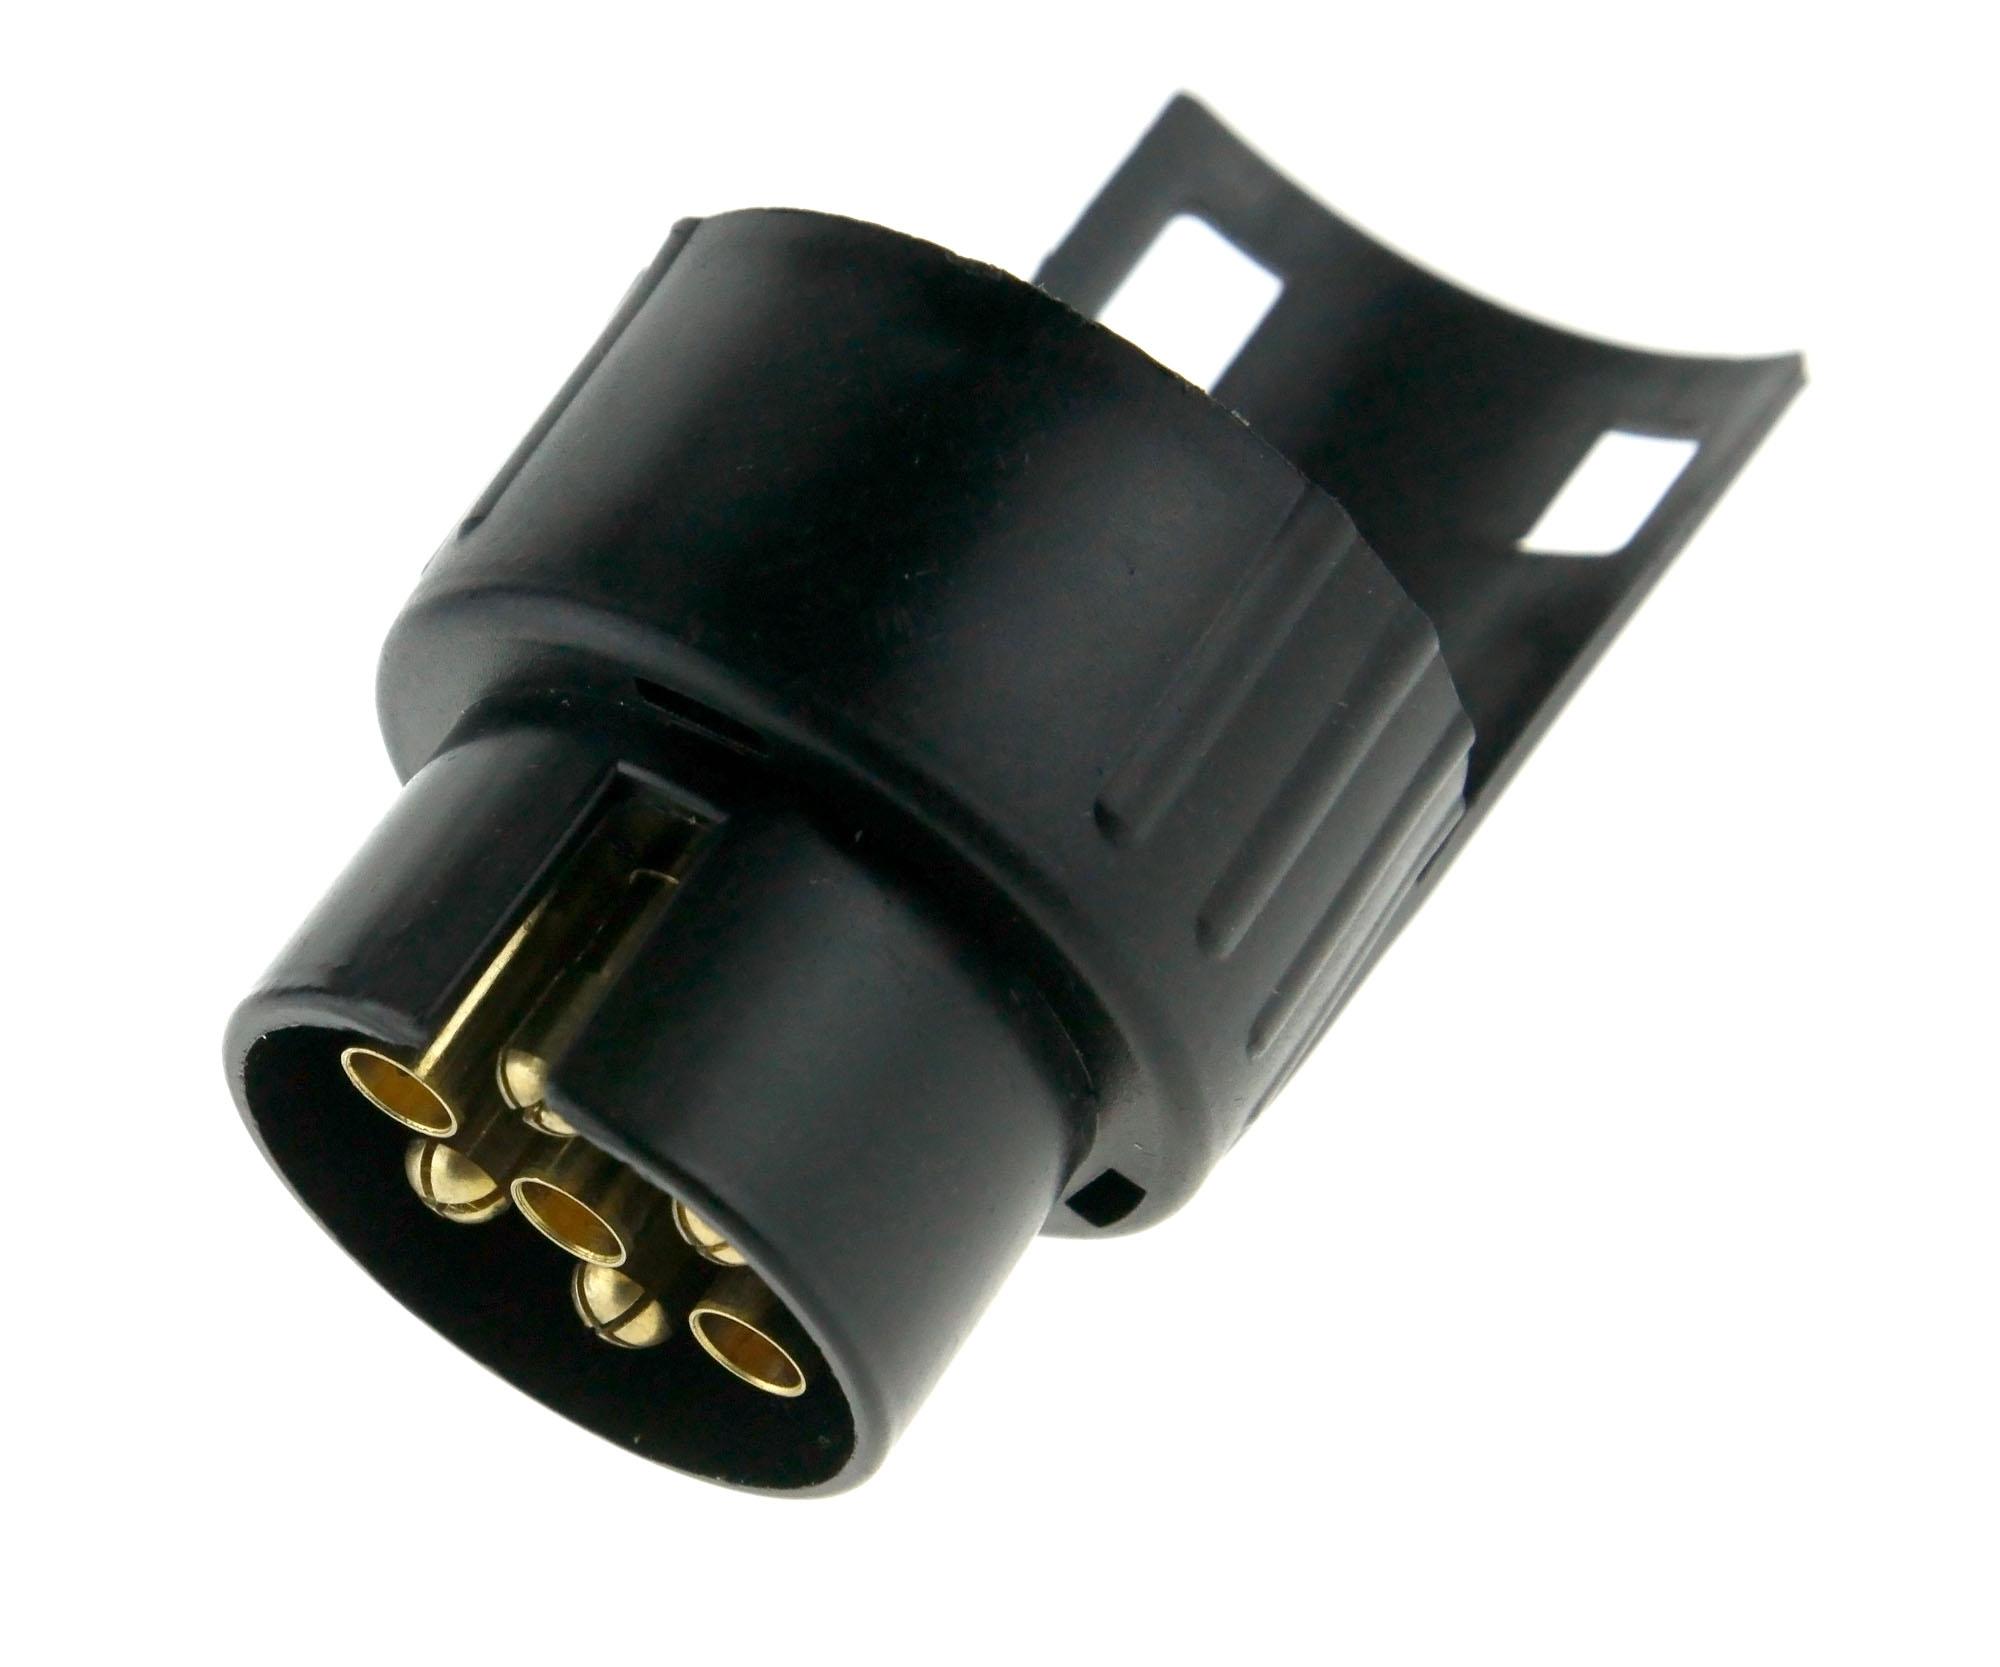 12V 7pin to 13pin Elektrischer Konverter Stecker Adapter LKW ...